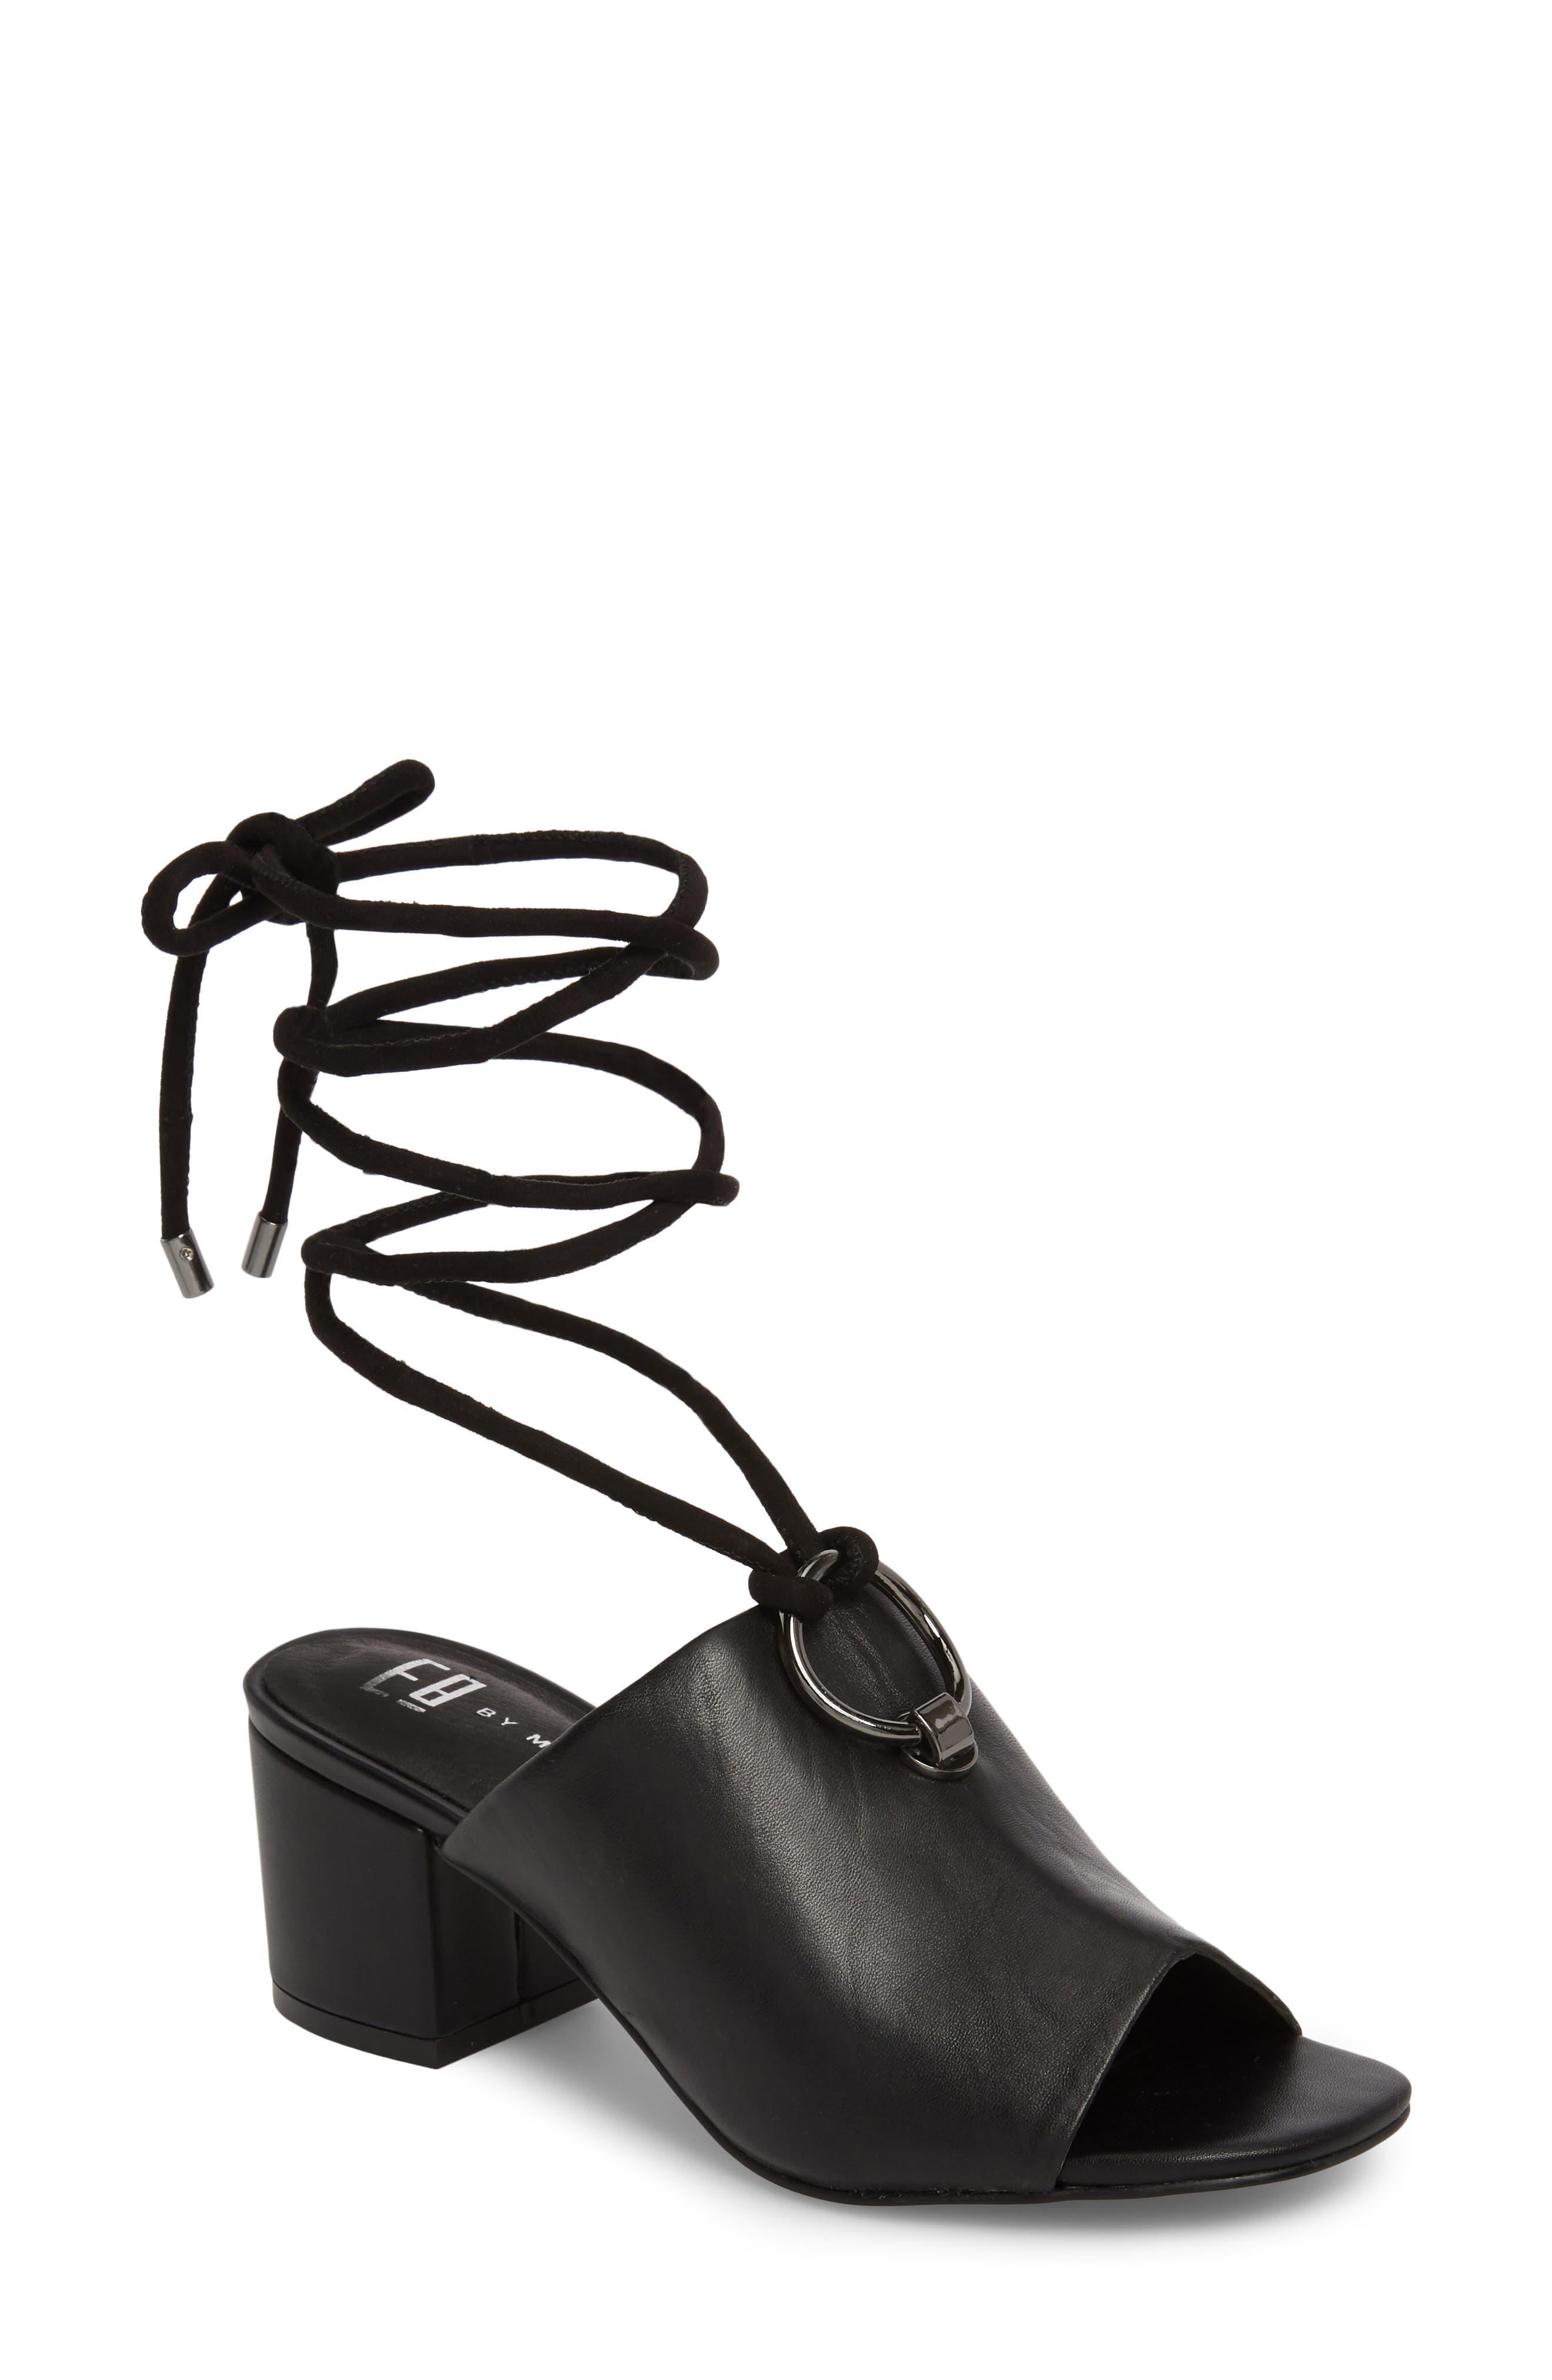 Mason Ankle Tie Sandal,                             Main thumbnail 1, color,                             BLACK LEATHER